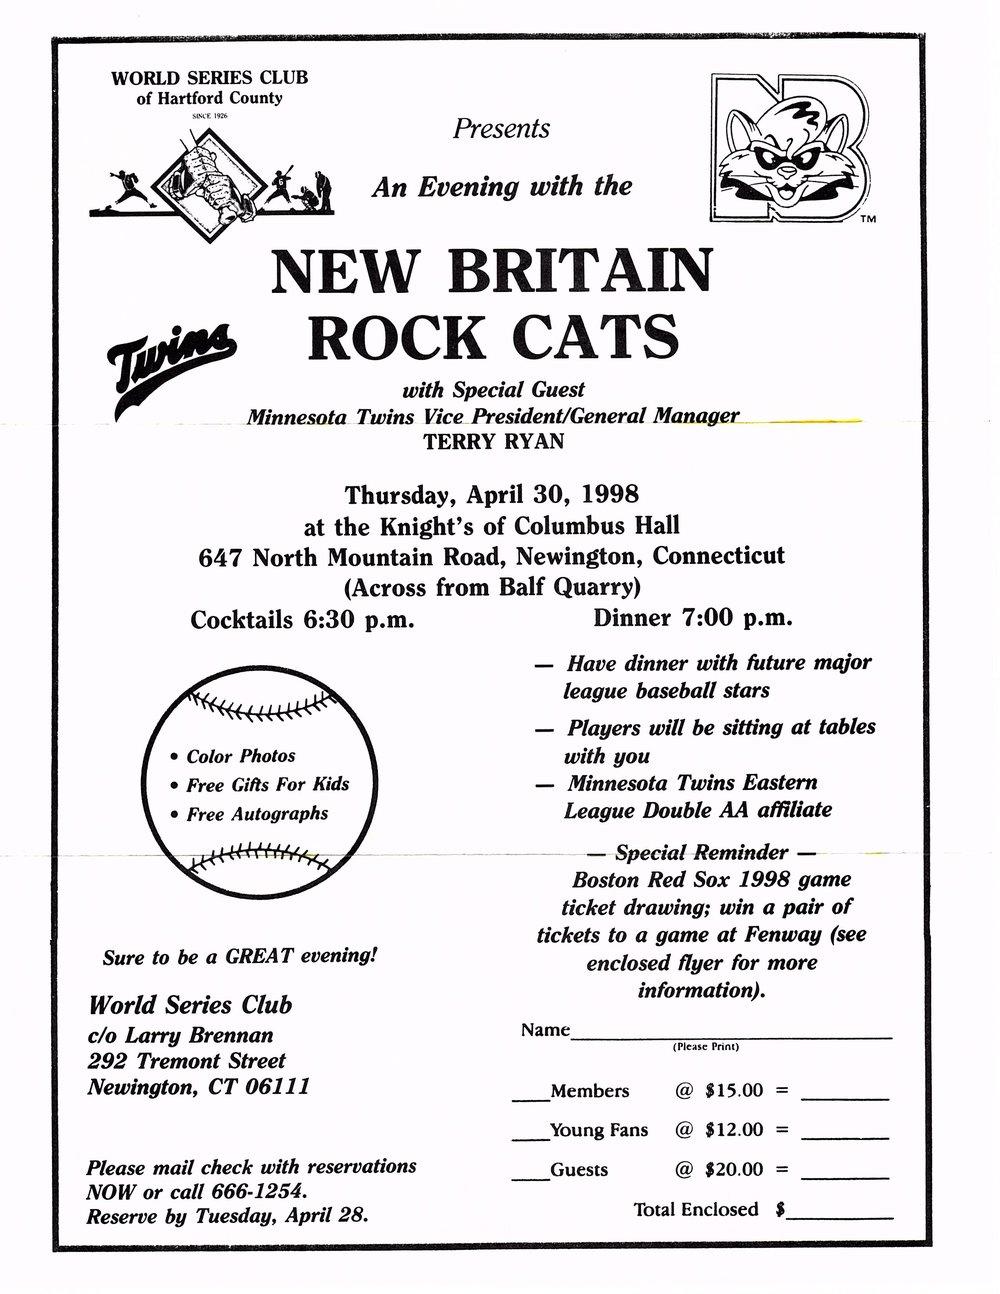 19980430 New Britain Rock Cats.jpg